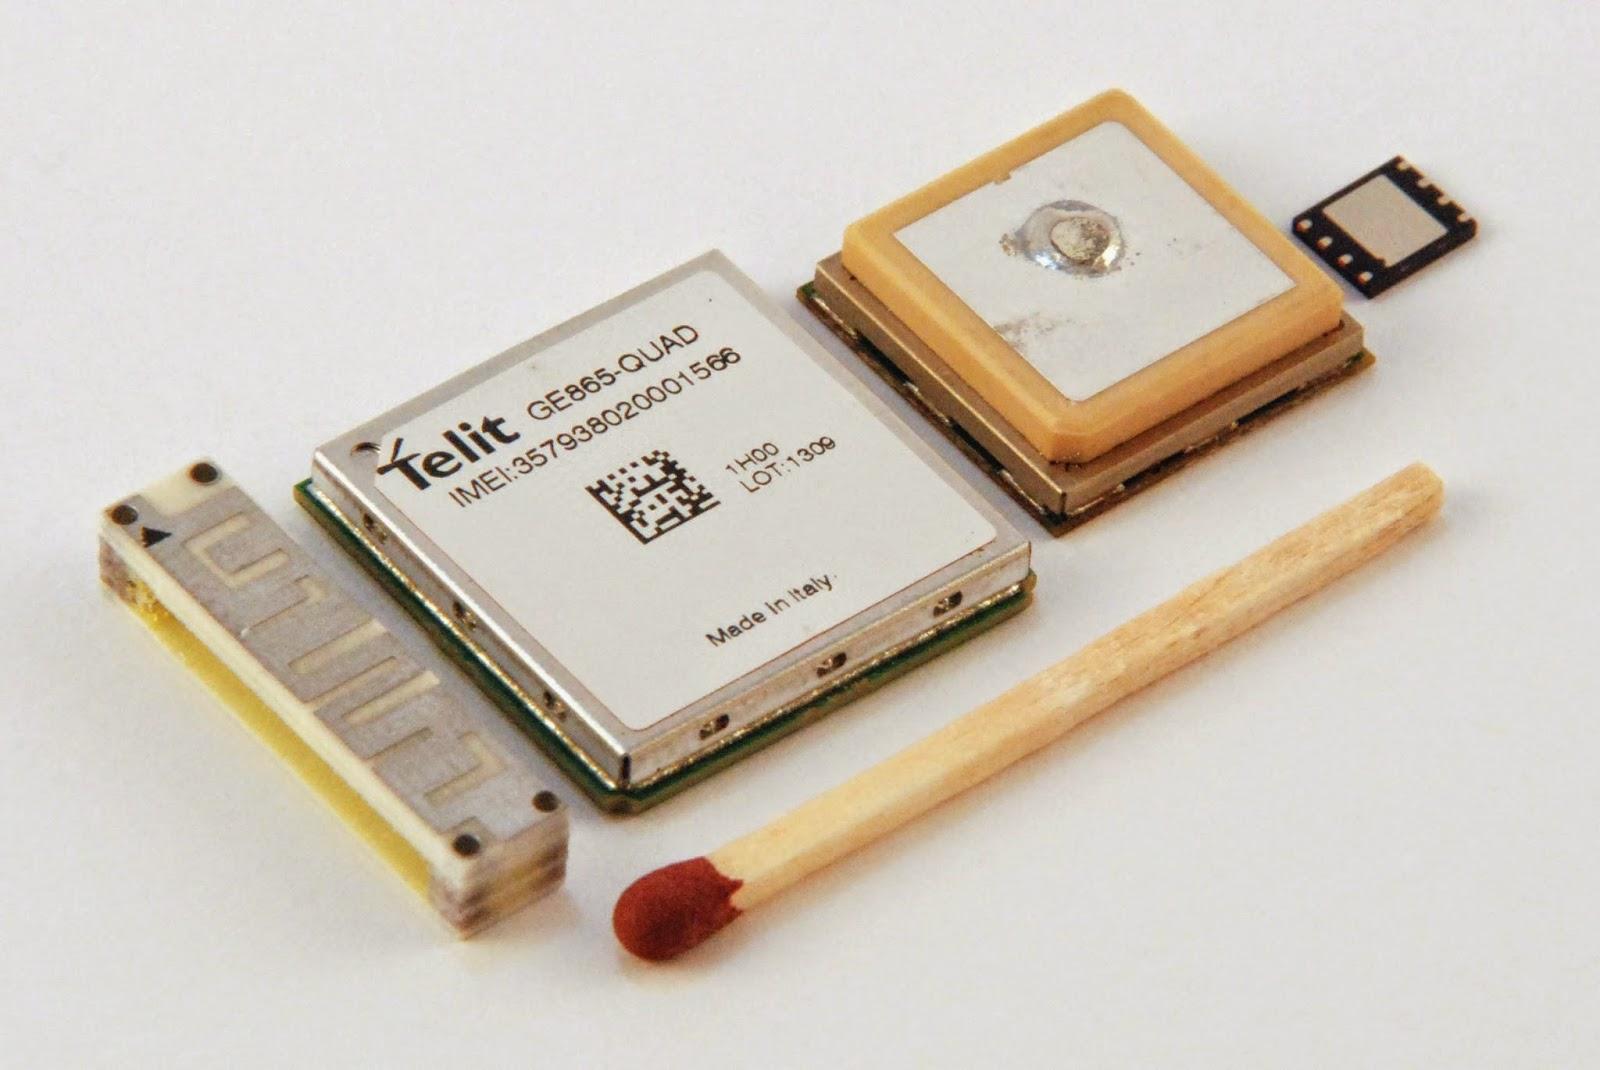 small gps tracker chip